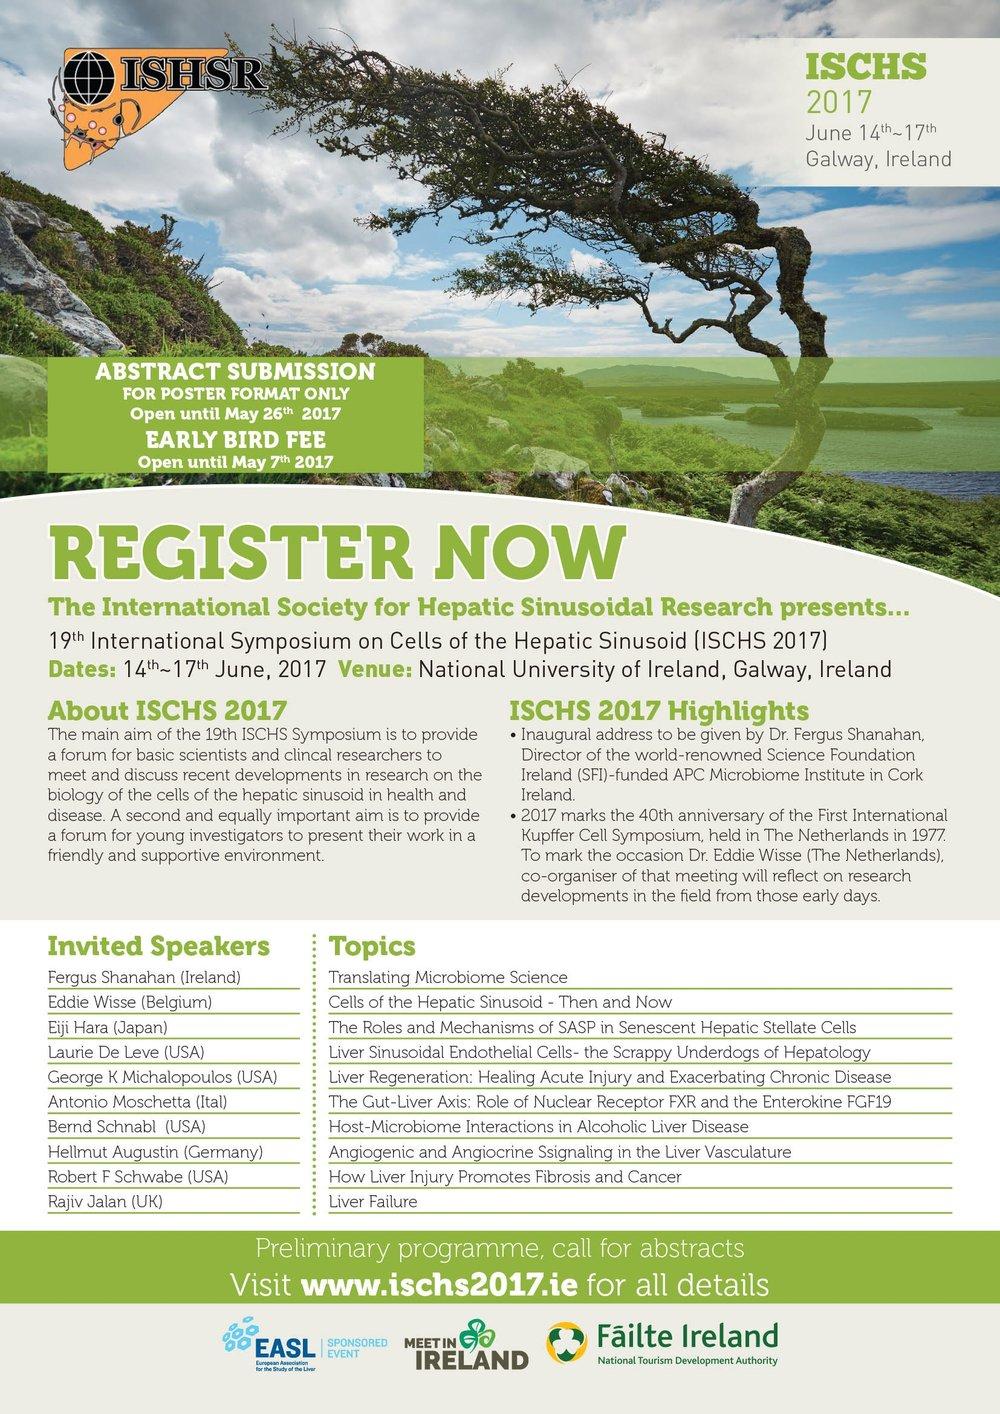 ISCHS 2017 Conference Flyer